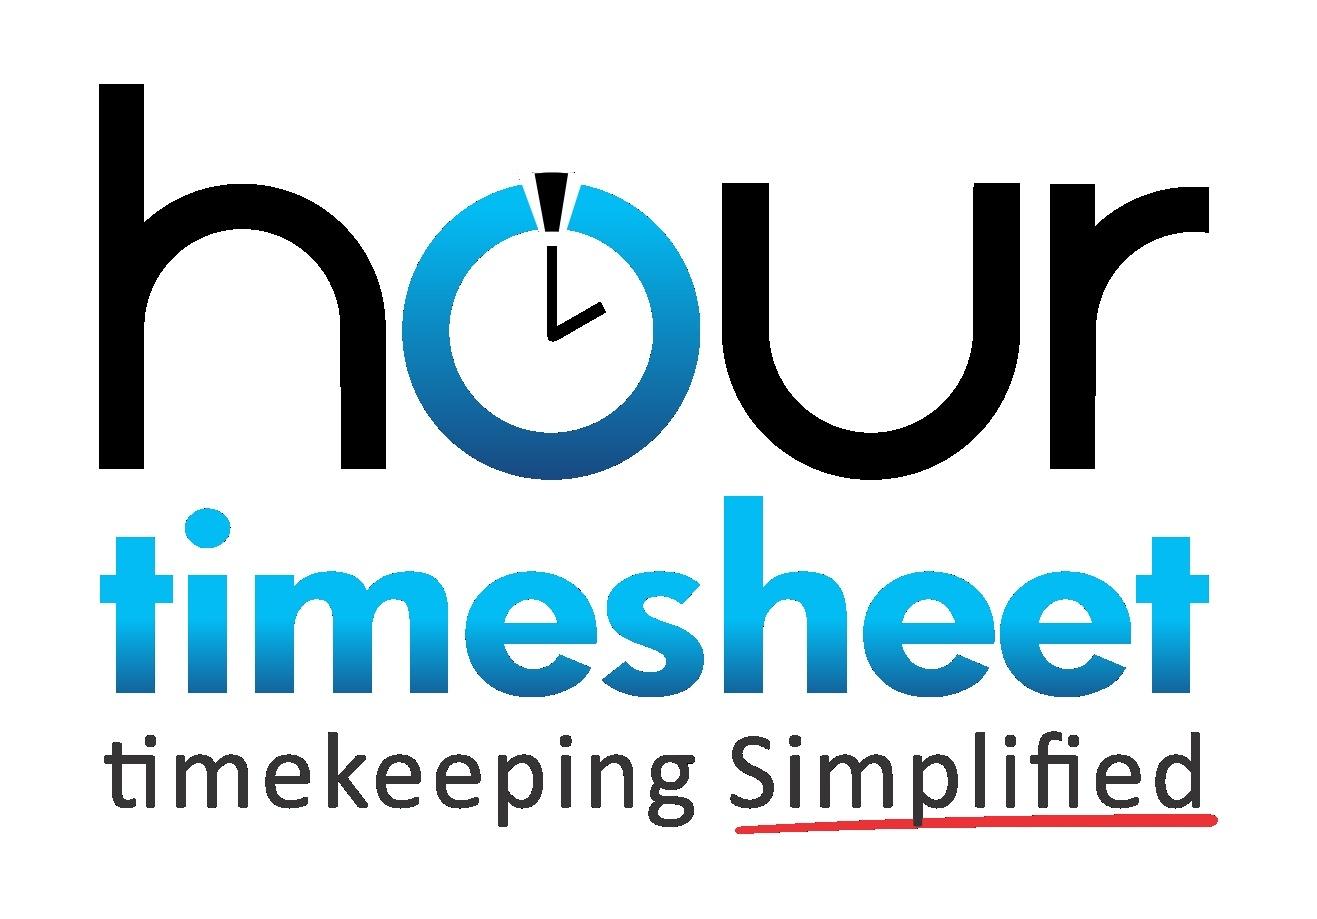 Hour Time Sheet Logo